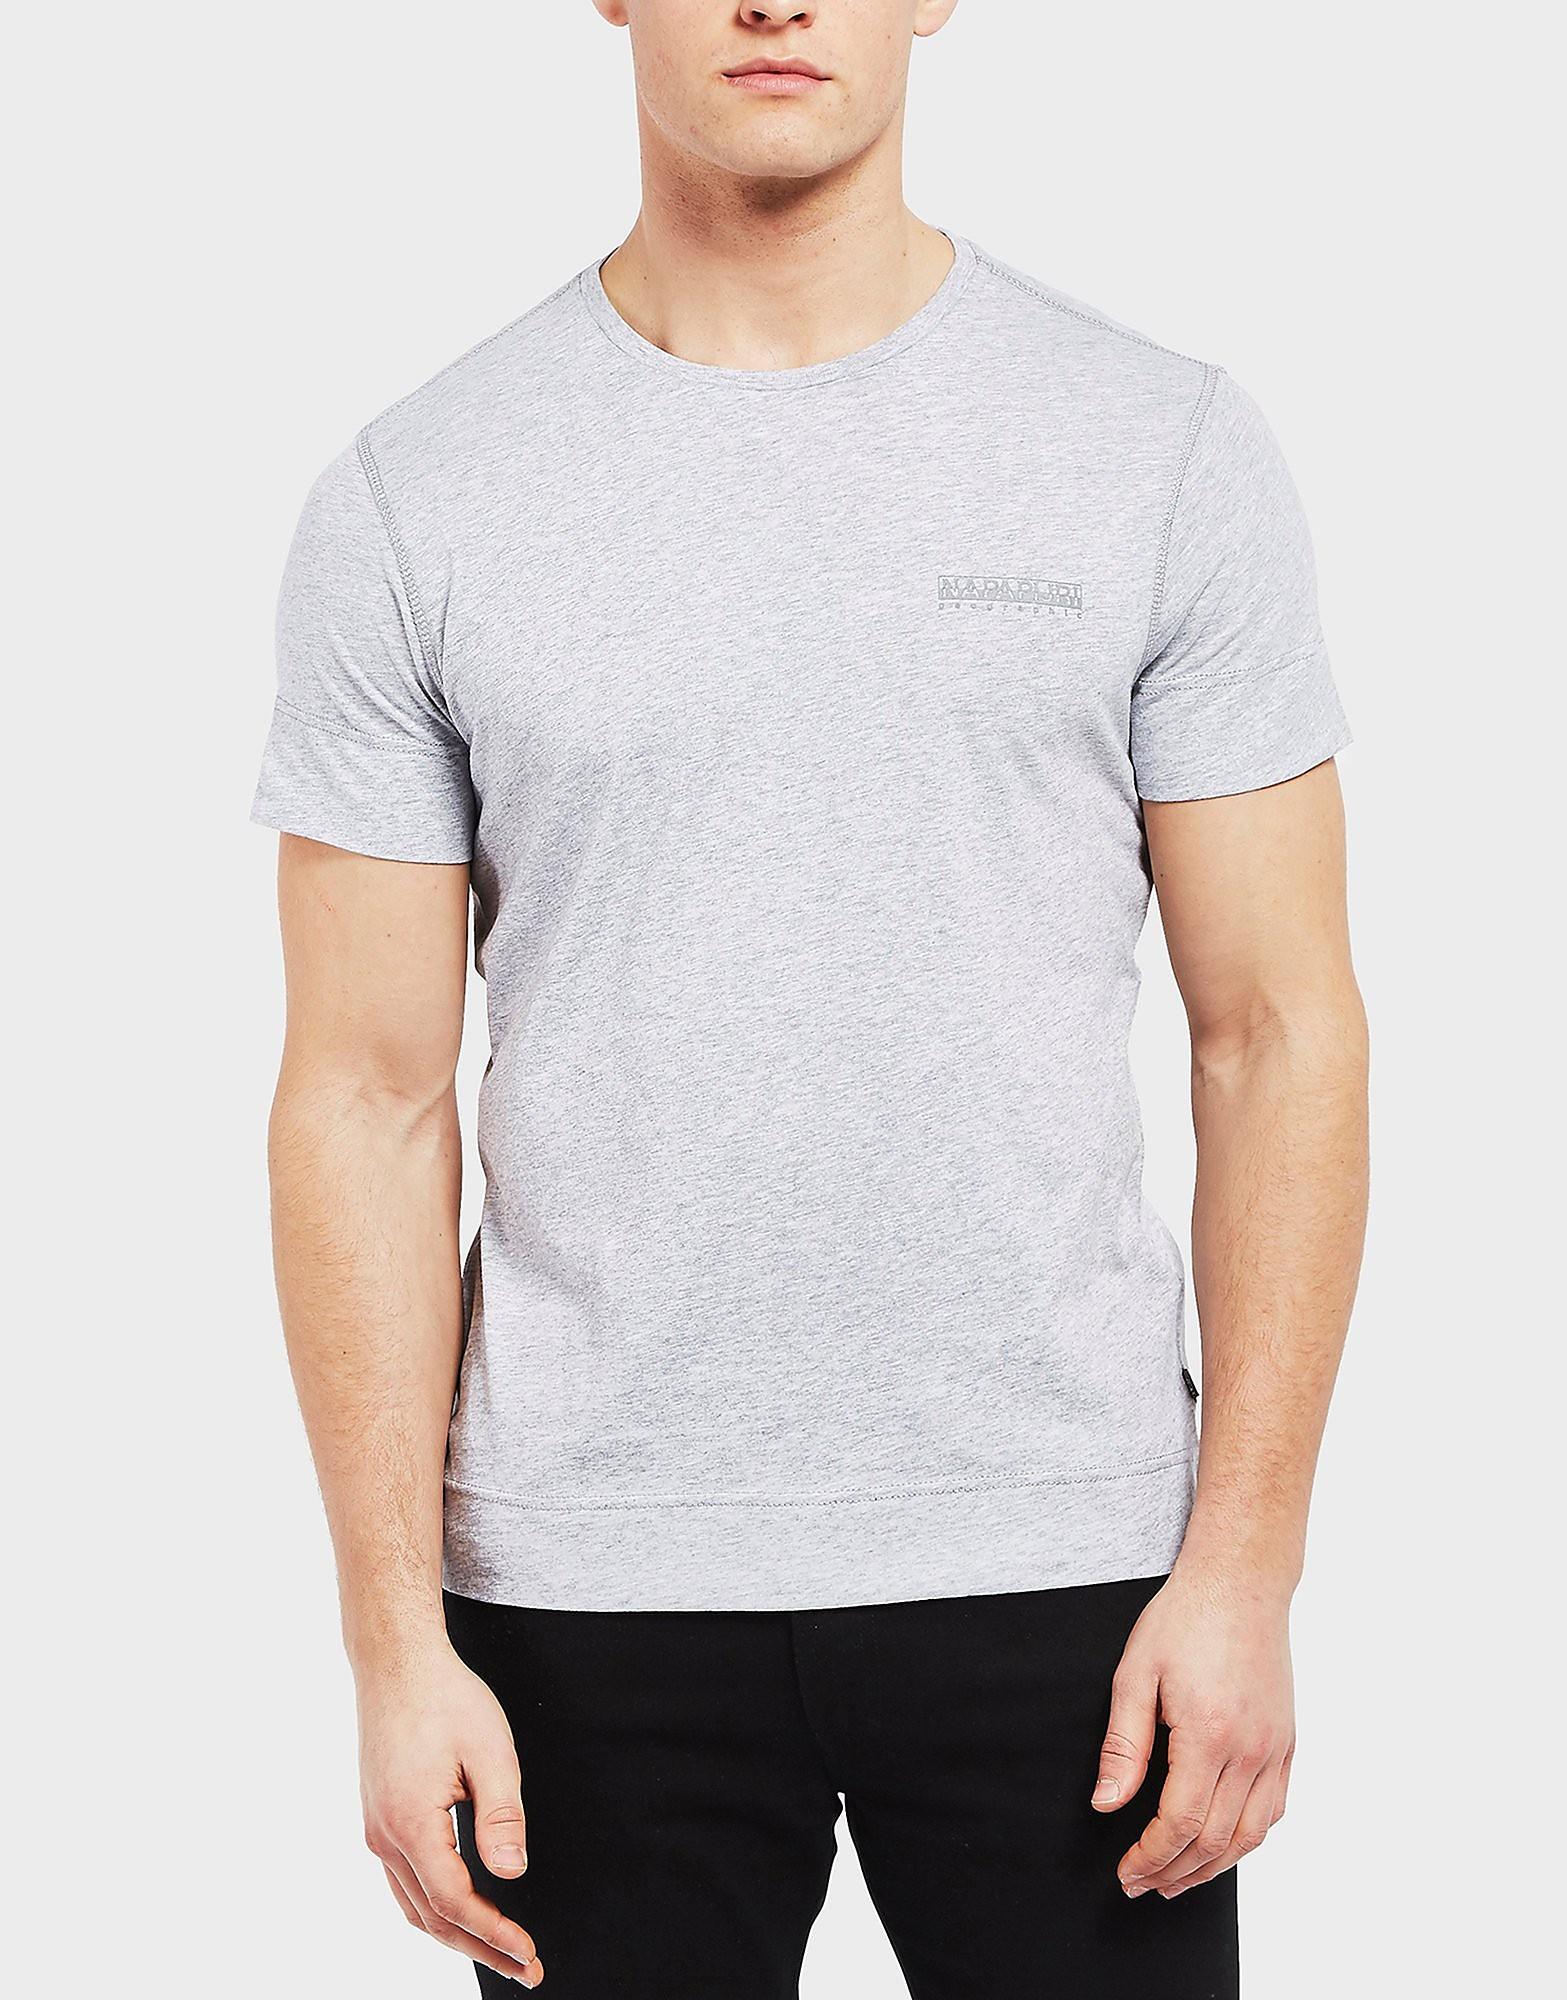 Napapijri Small Logo Short Sleeve T-Shirt